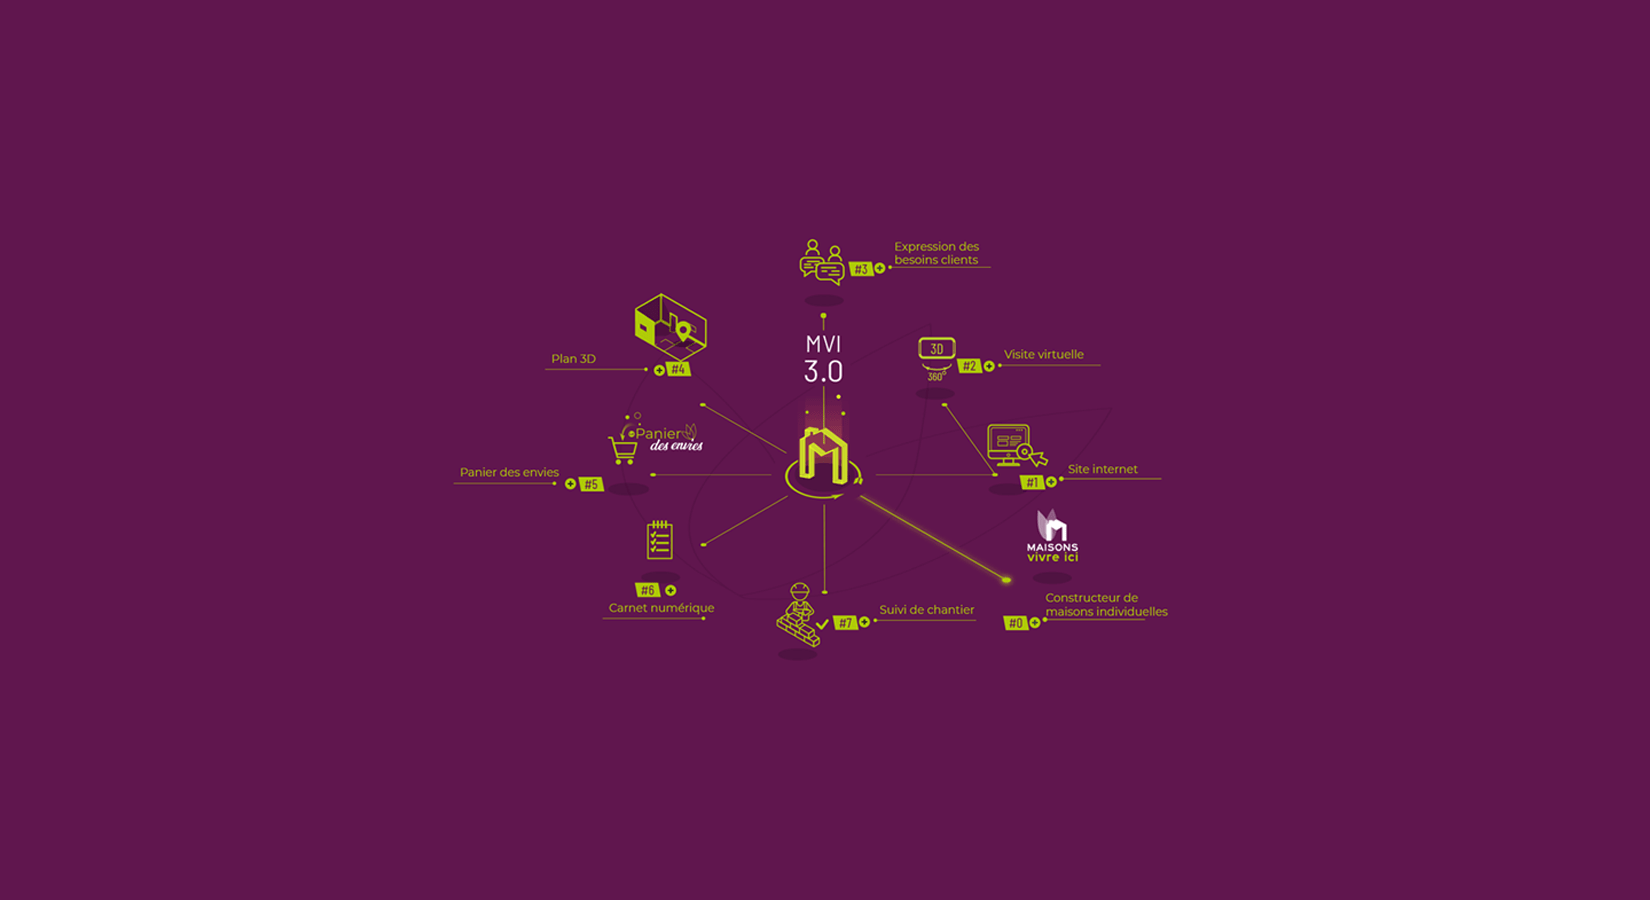 constellation Maisons Vivre Ici 3.0